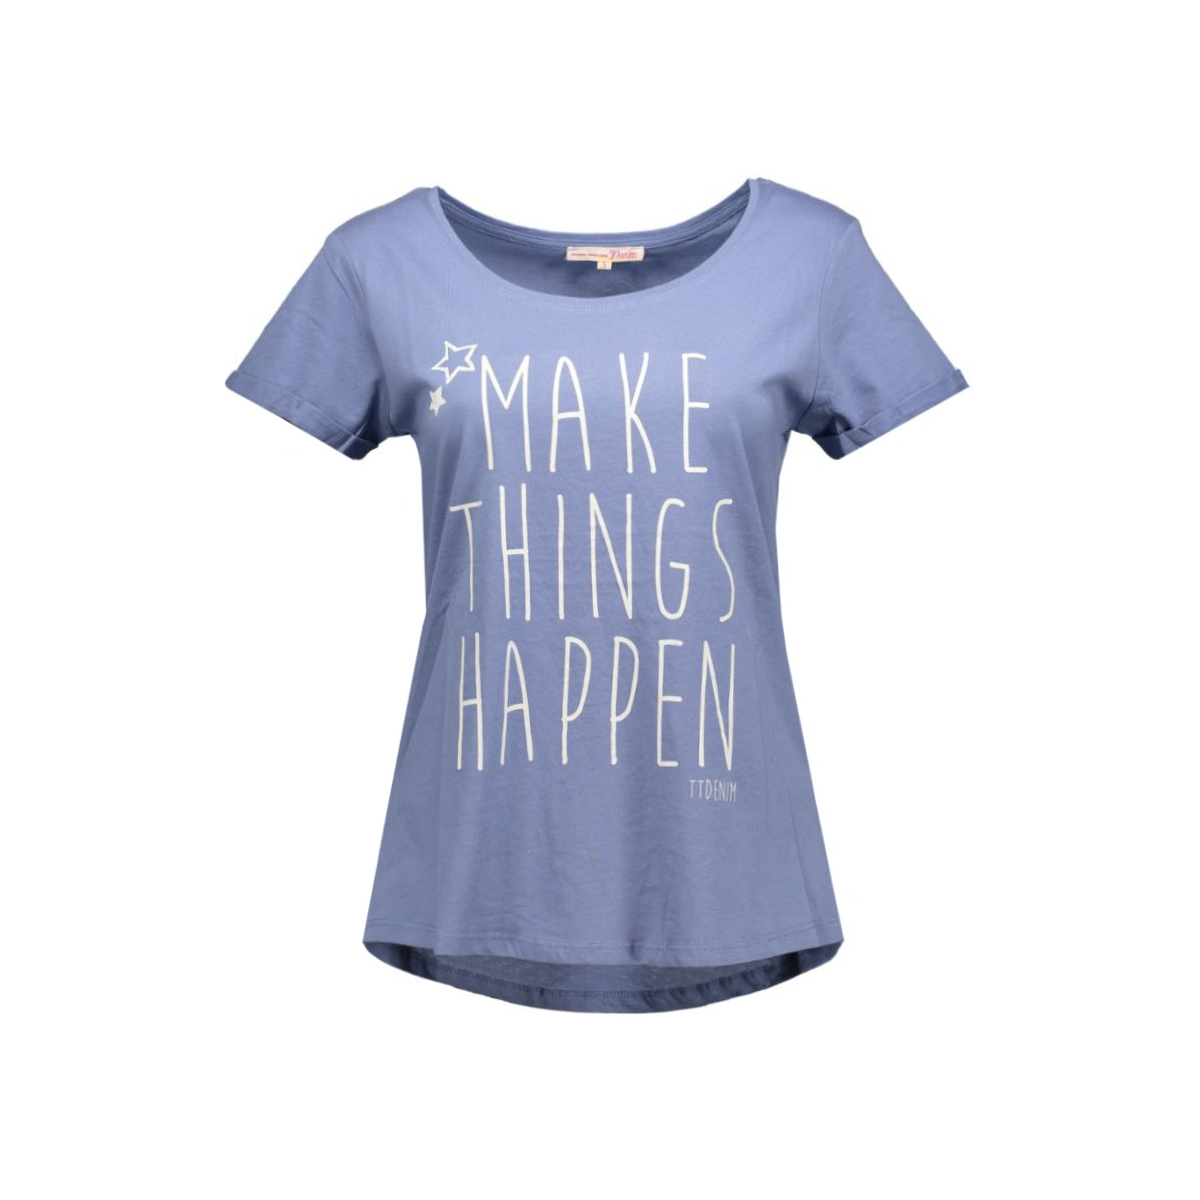 1033492.09.71 tom tailor t-shirt 6731